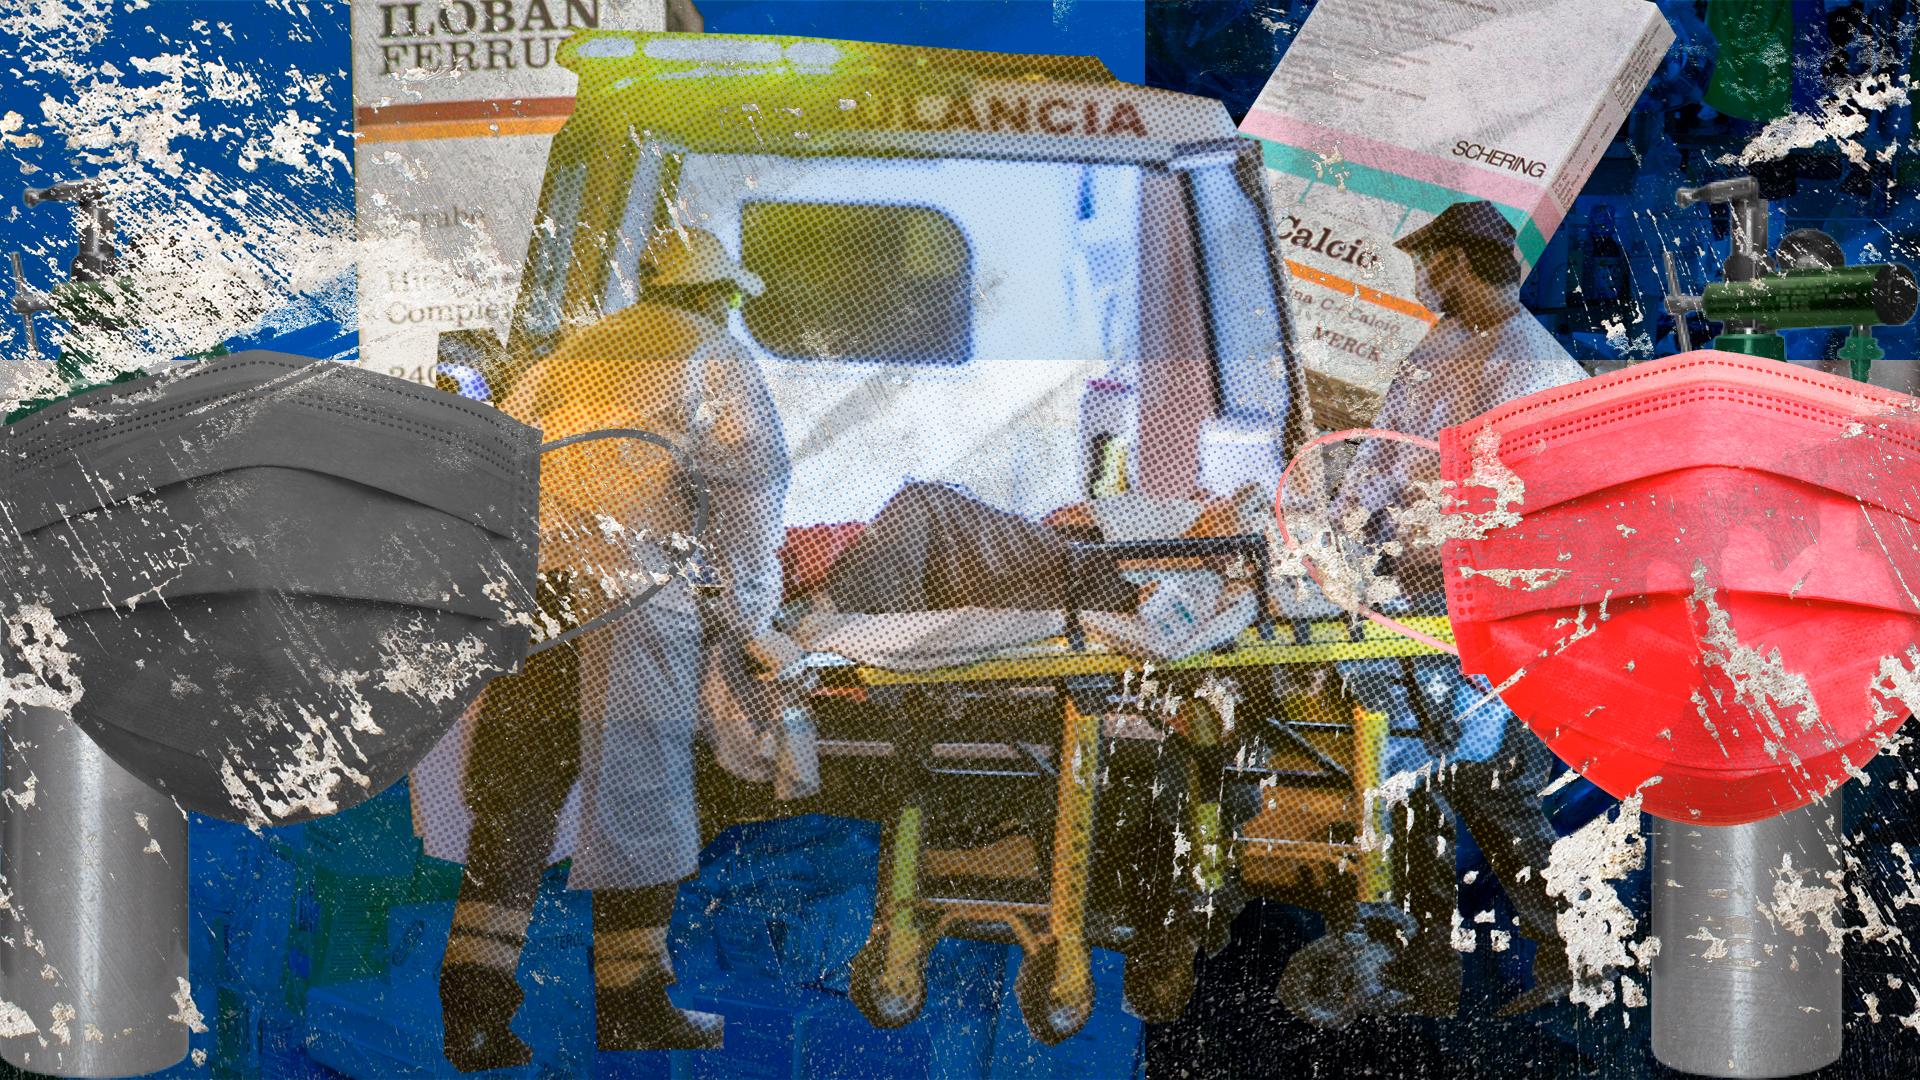 La receta lucrativa de la COVID-19 en Nicaragua